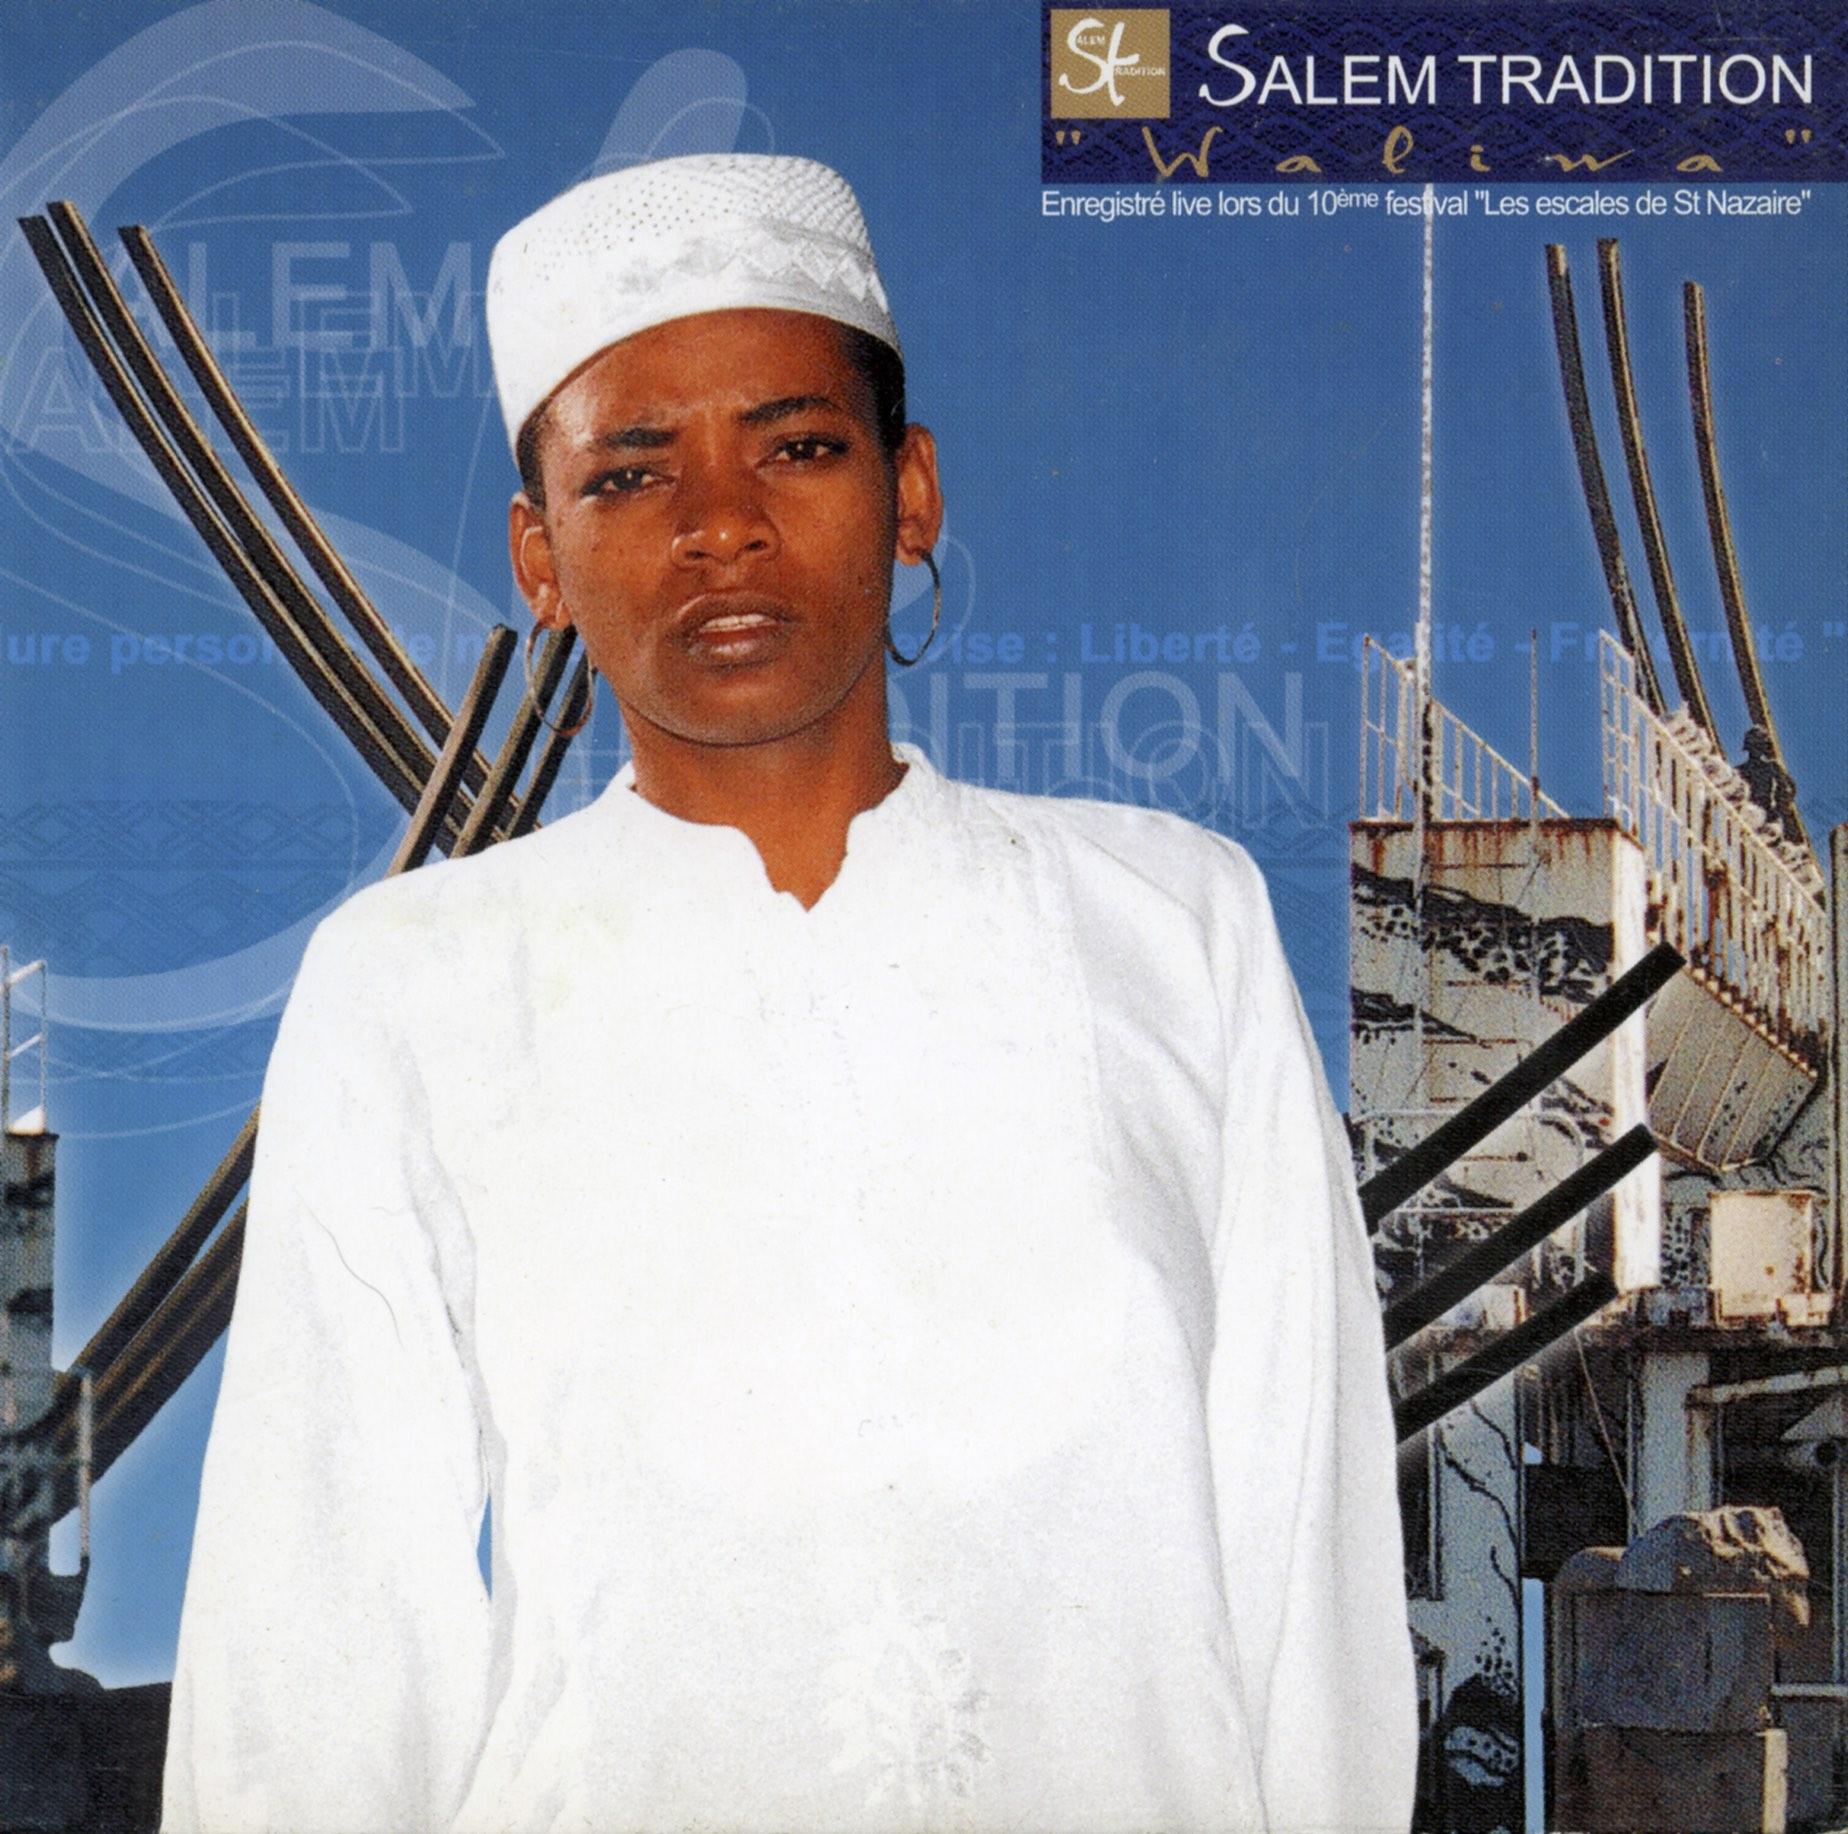 2001 - Salem Tradition